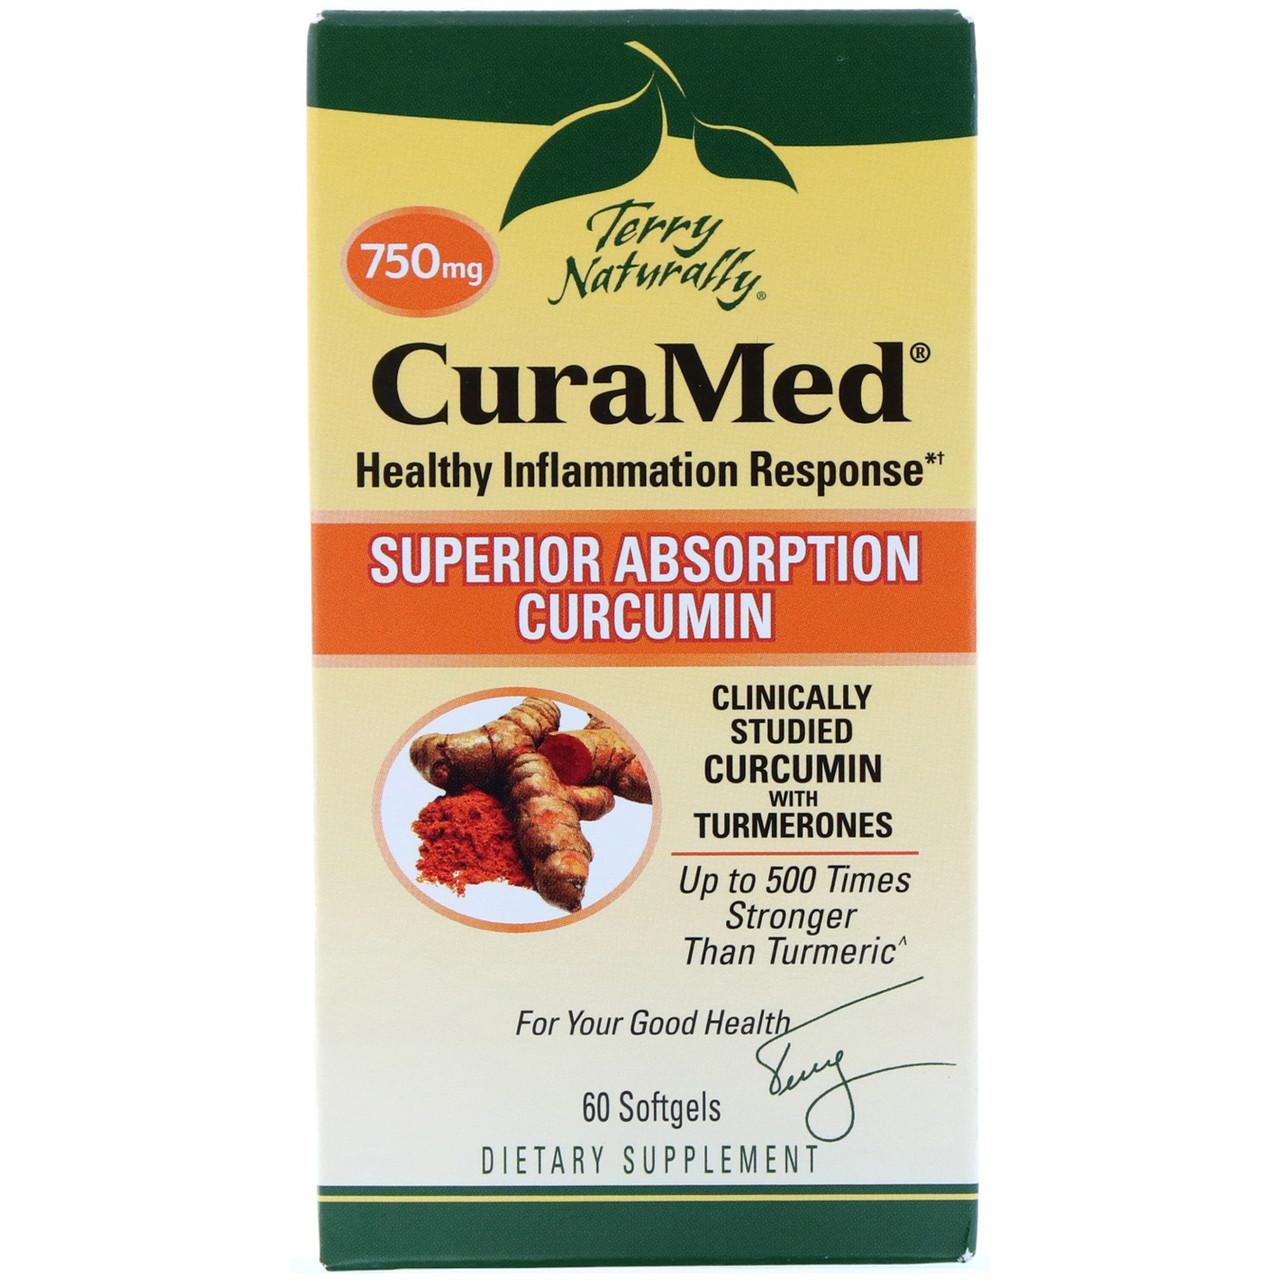 EuroPharma, Terry Naturally, CuraMed, 750 mg, 60 Softgels